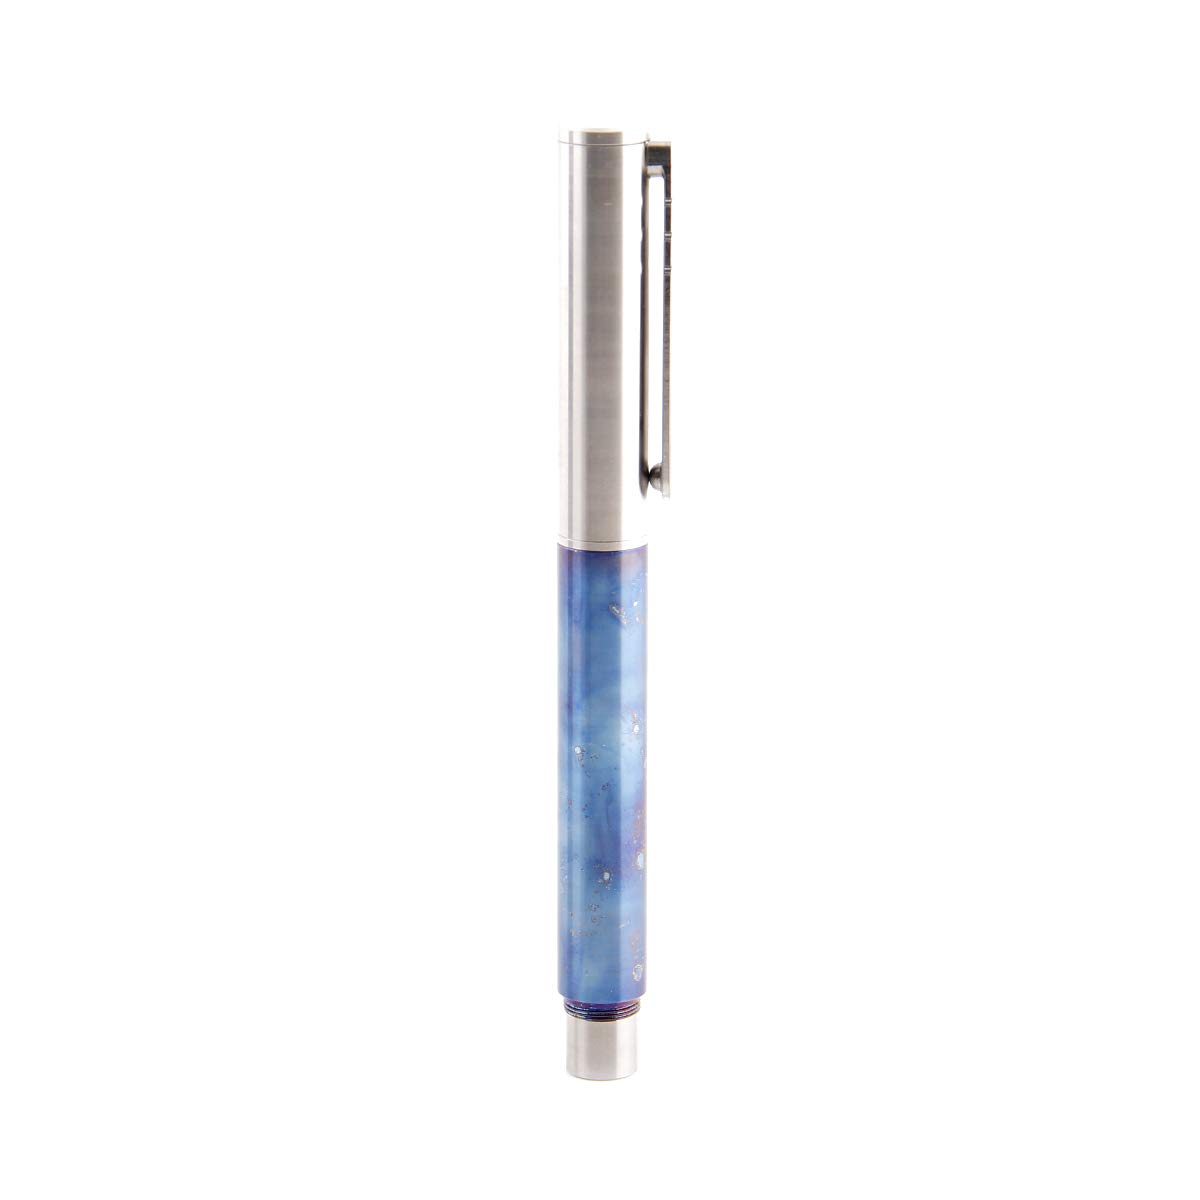 TITANER Icebreaker Titanium Lotus Tactical Pen Emergency Bolt Pen with Window Breaker(Blue) by TITANER (Image #4)